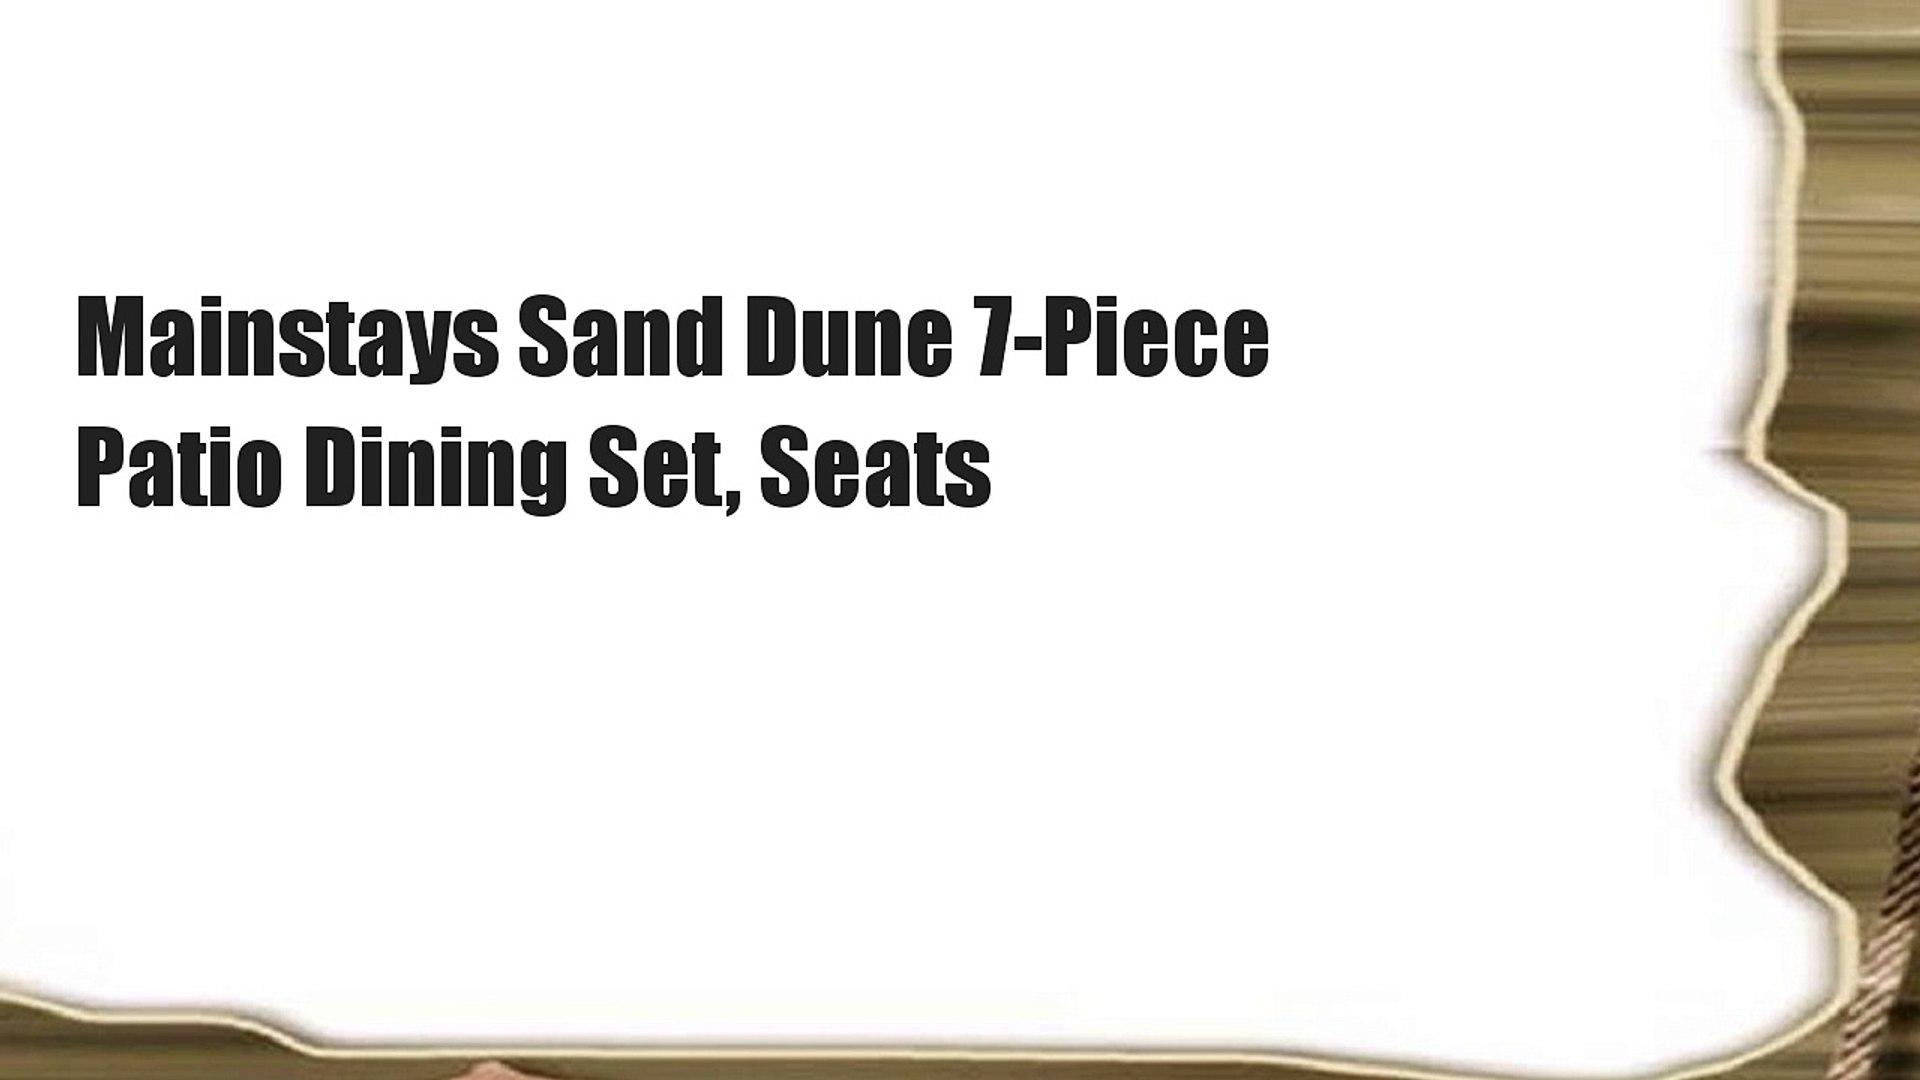 Mainstays Sand Dune 7 Piece Patio